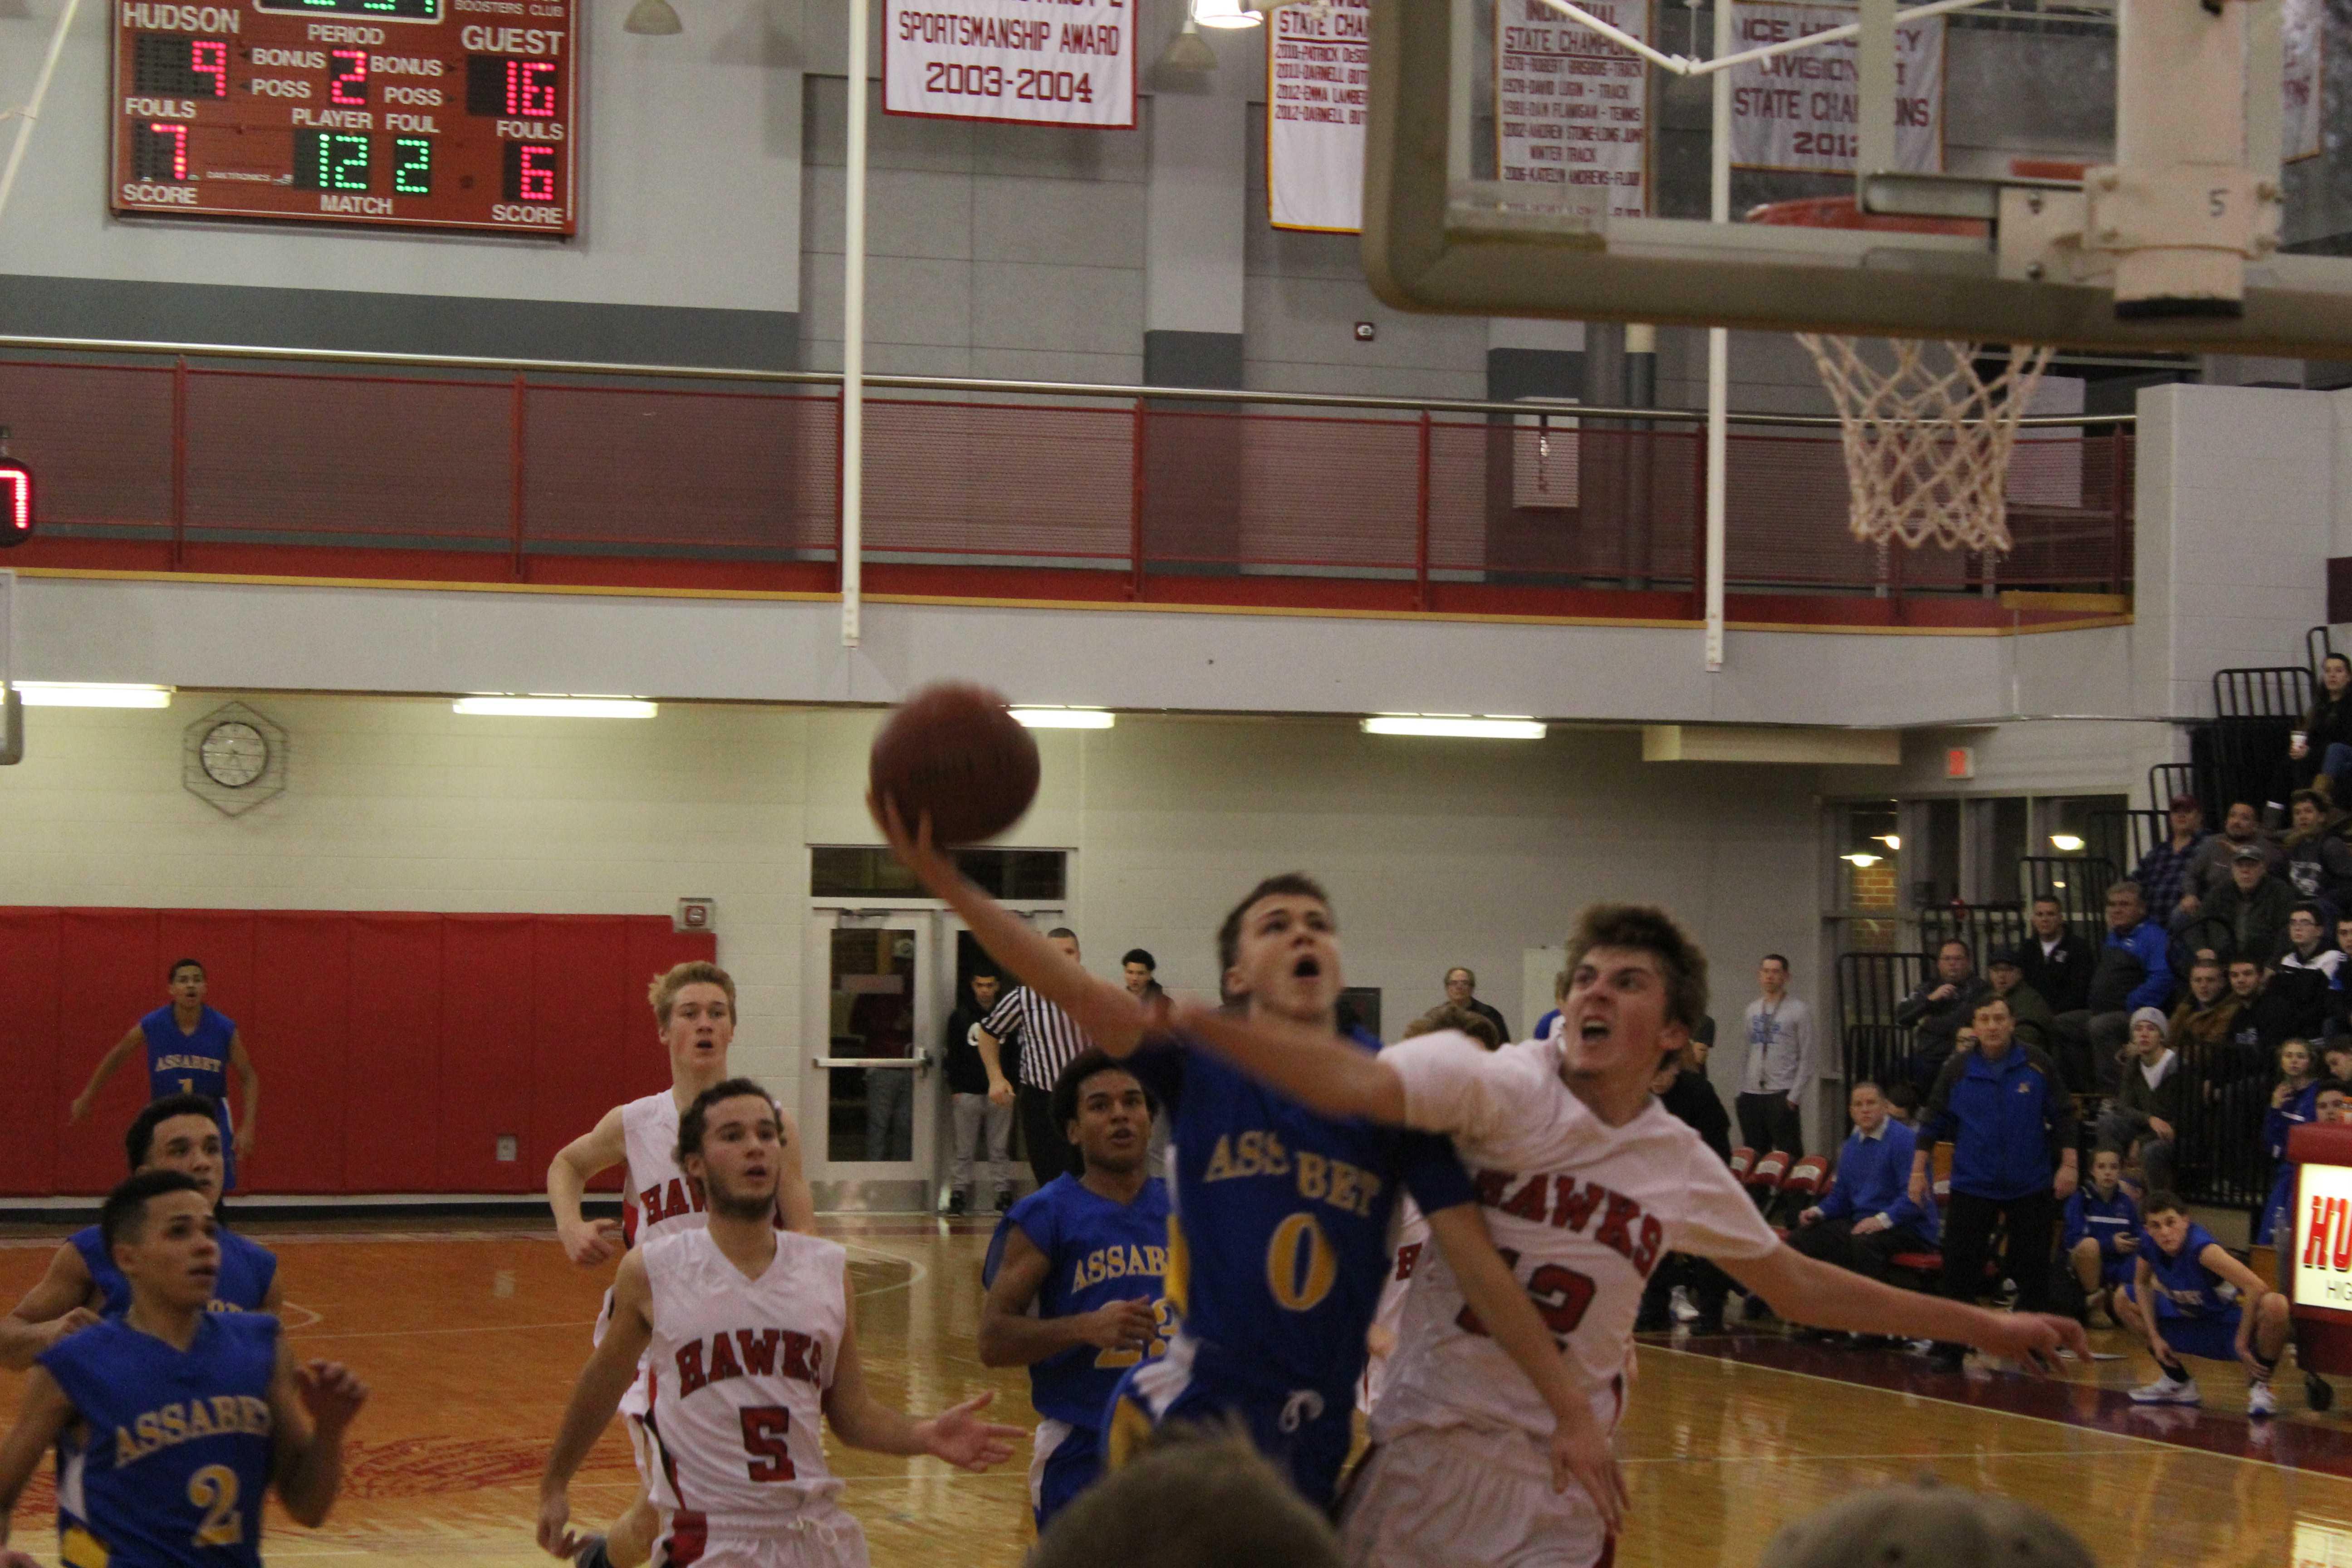 Boys Varsity Basketball vs Assabet (Gallery)